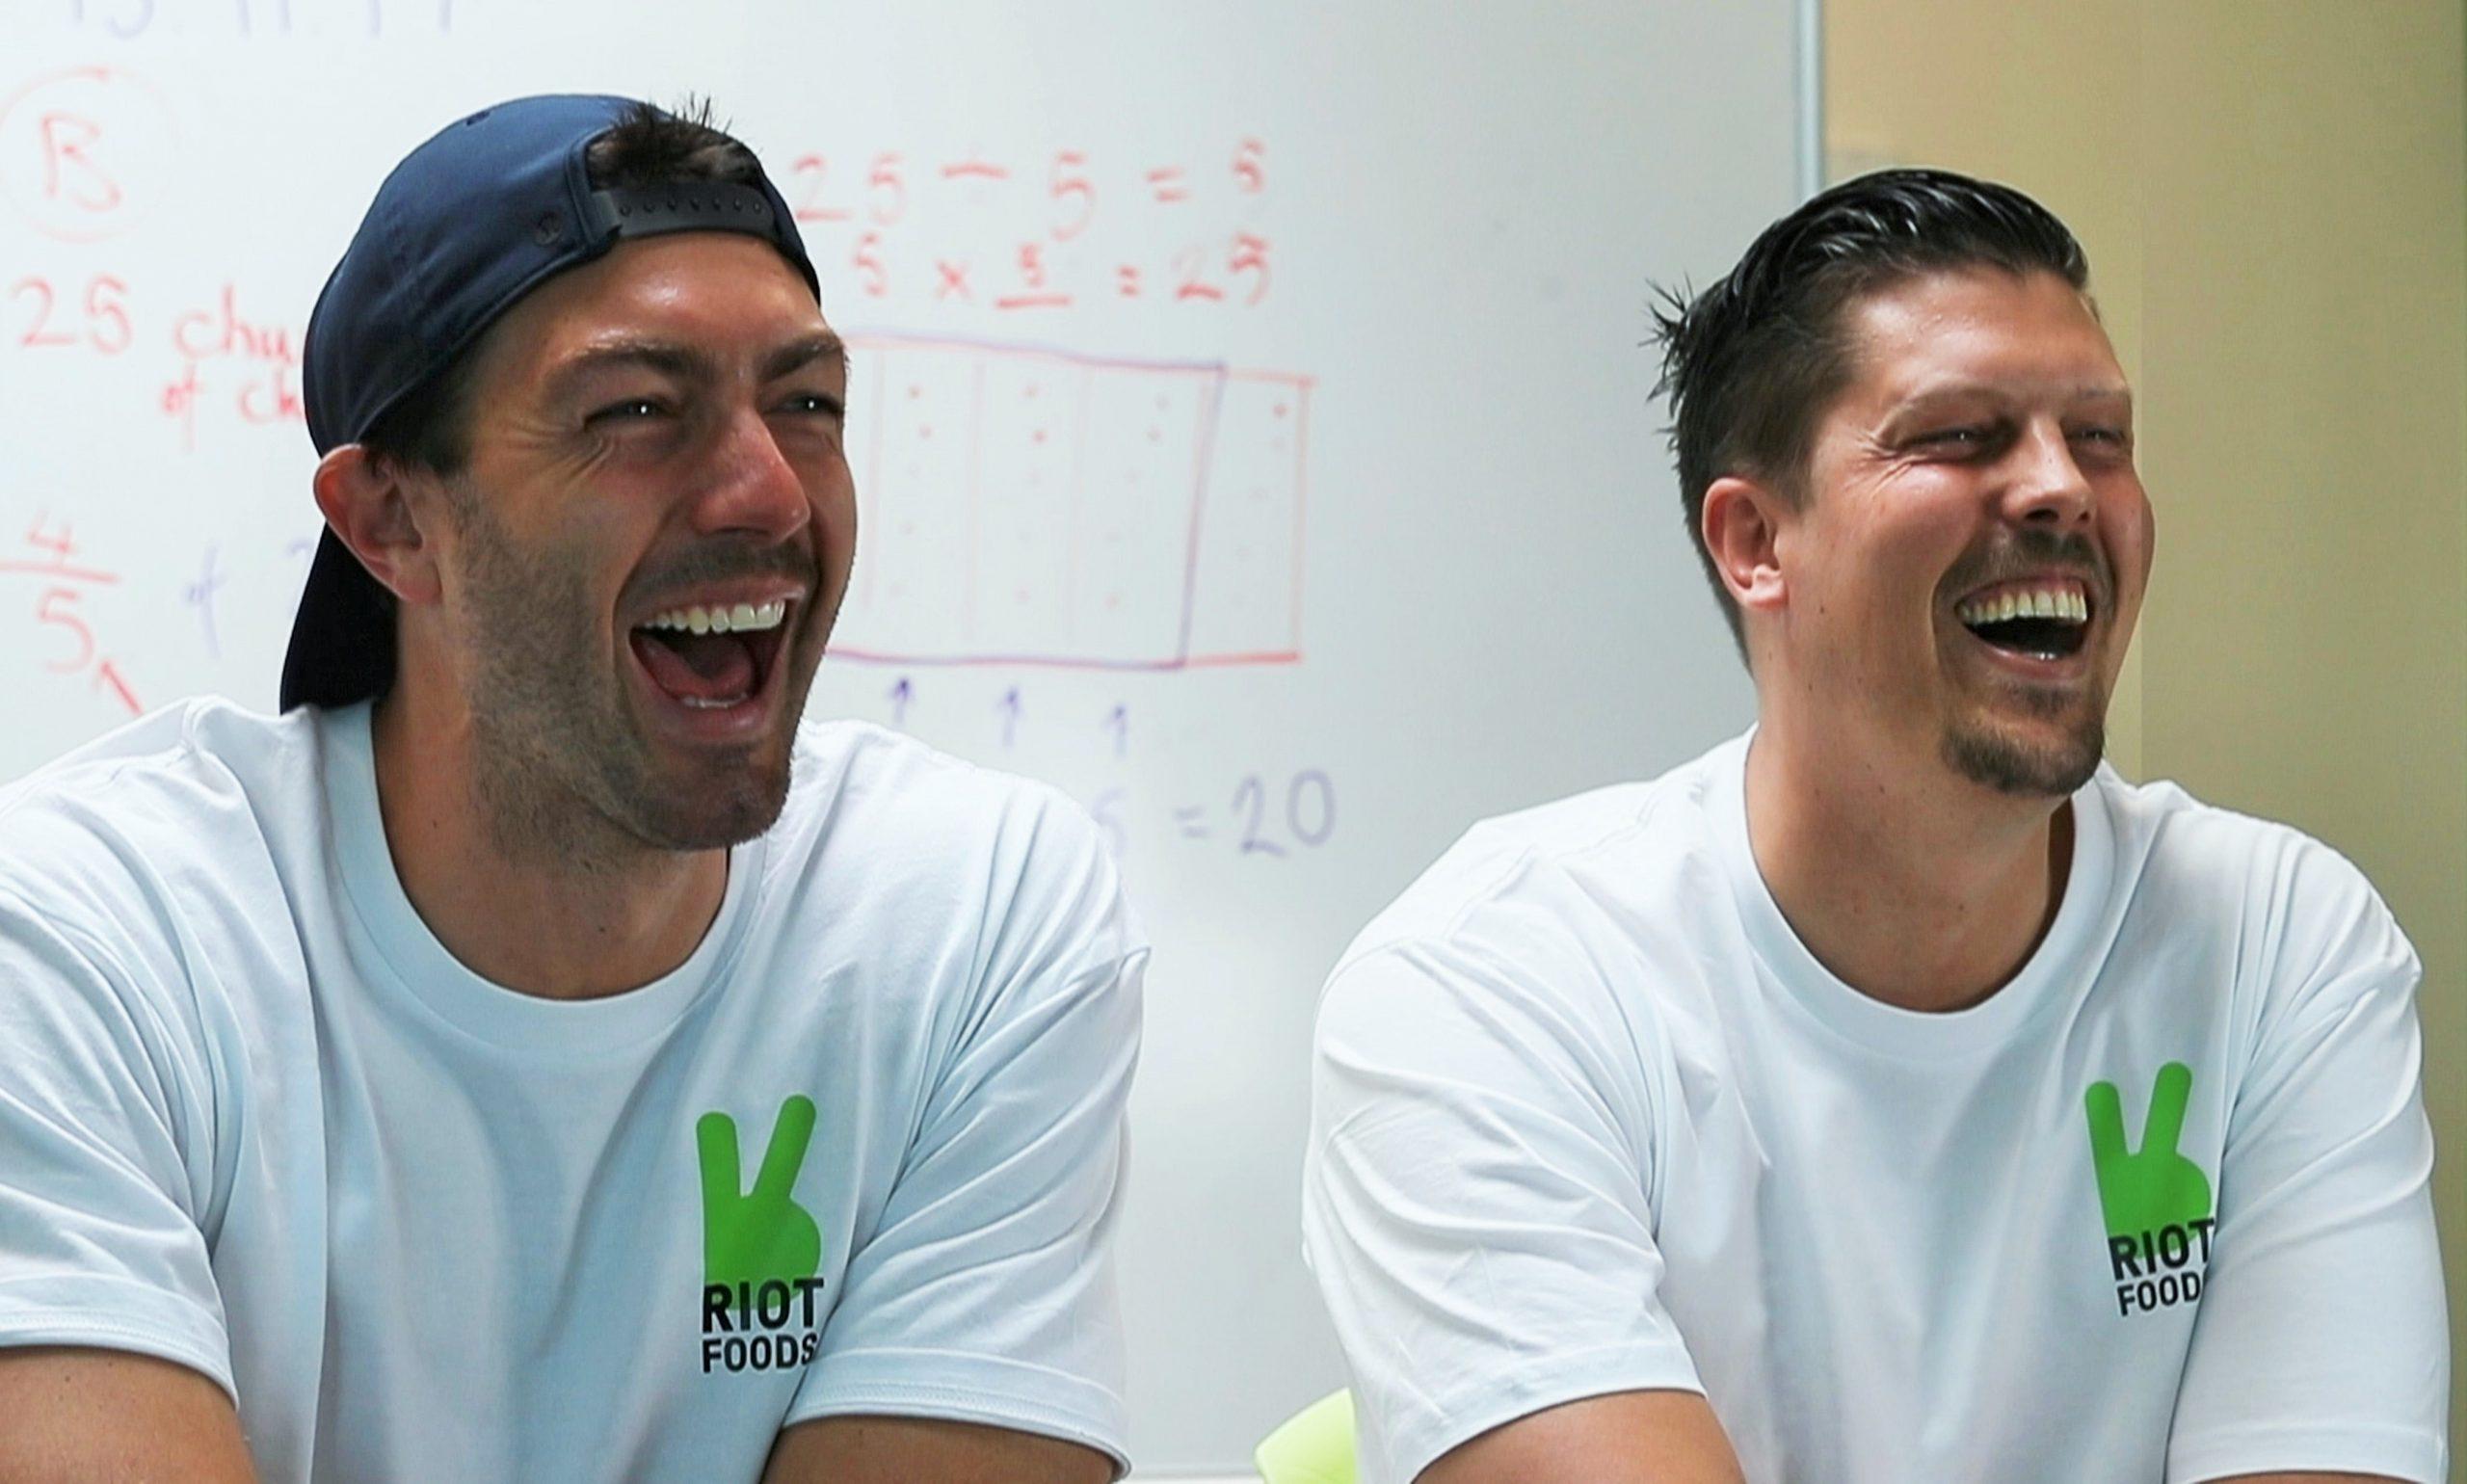 art green and ryan kamins laugh together